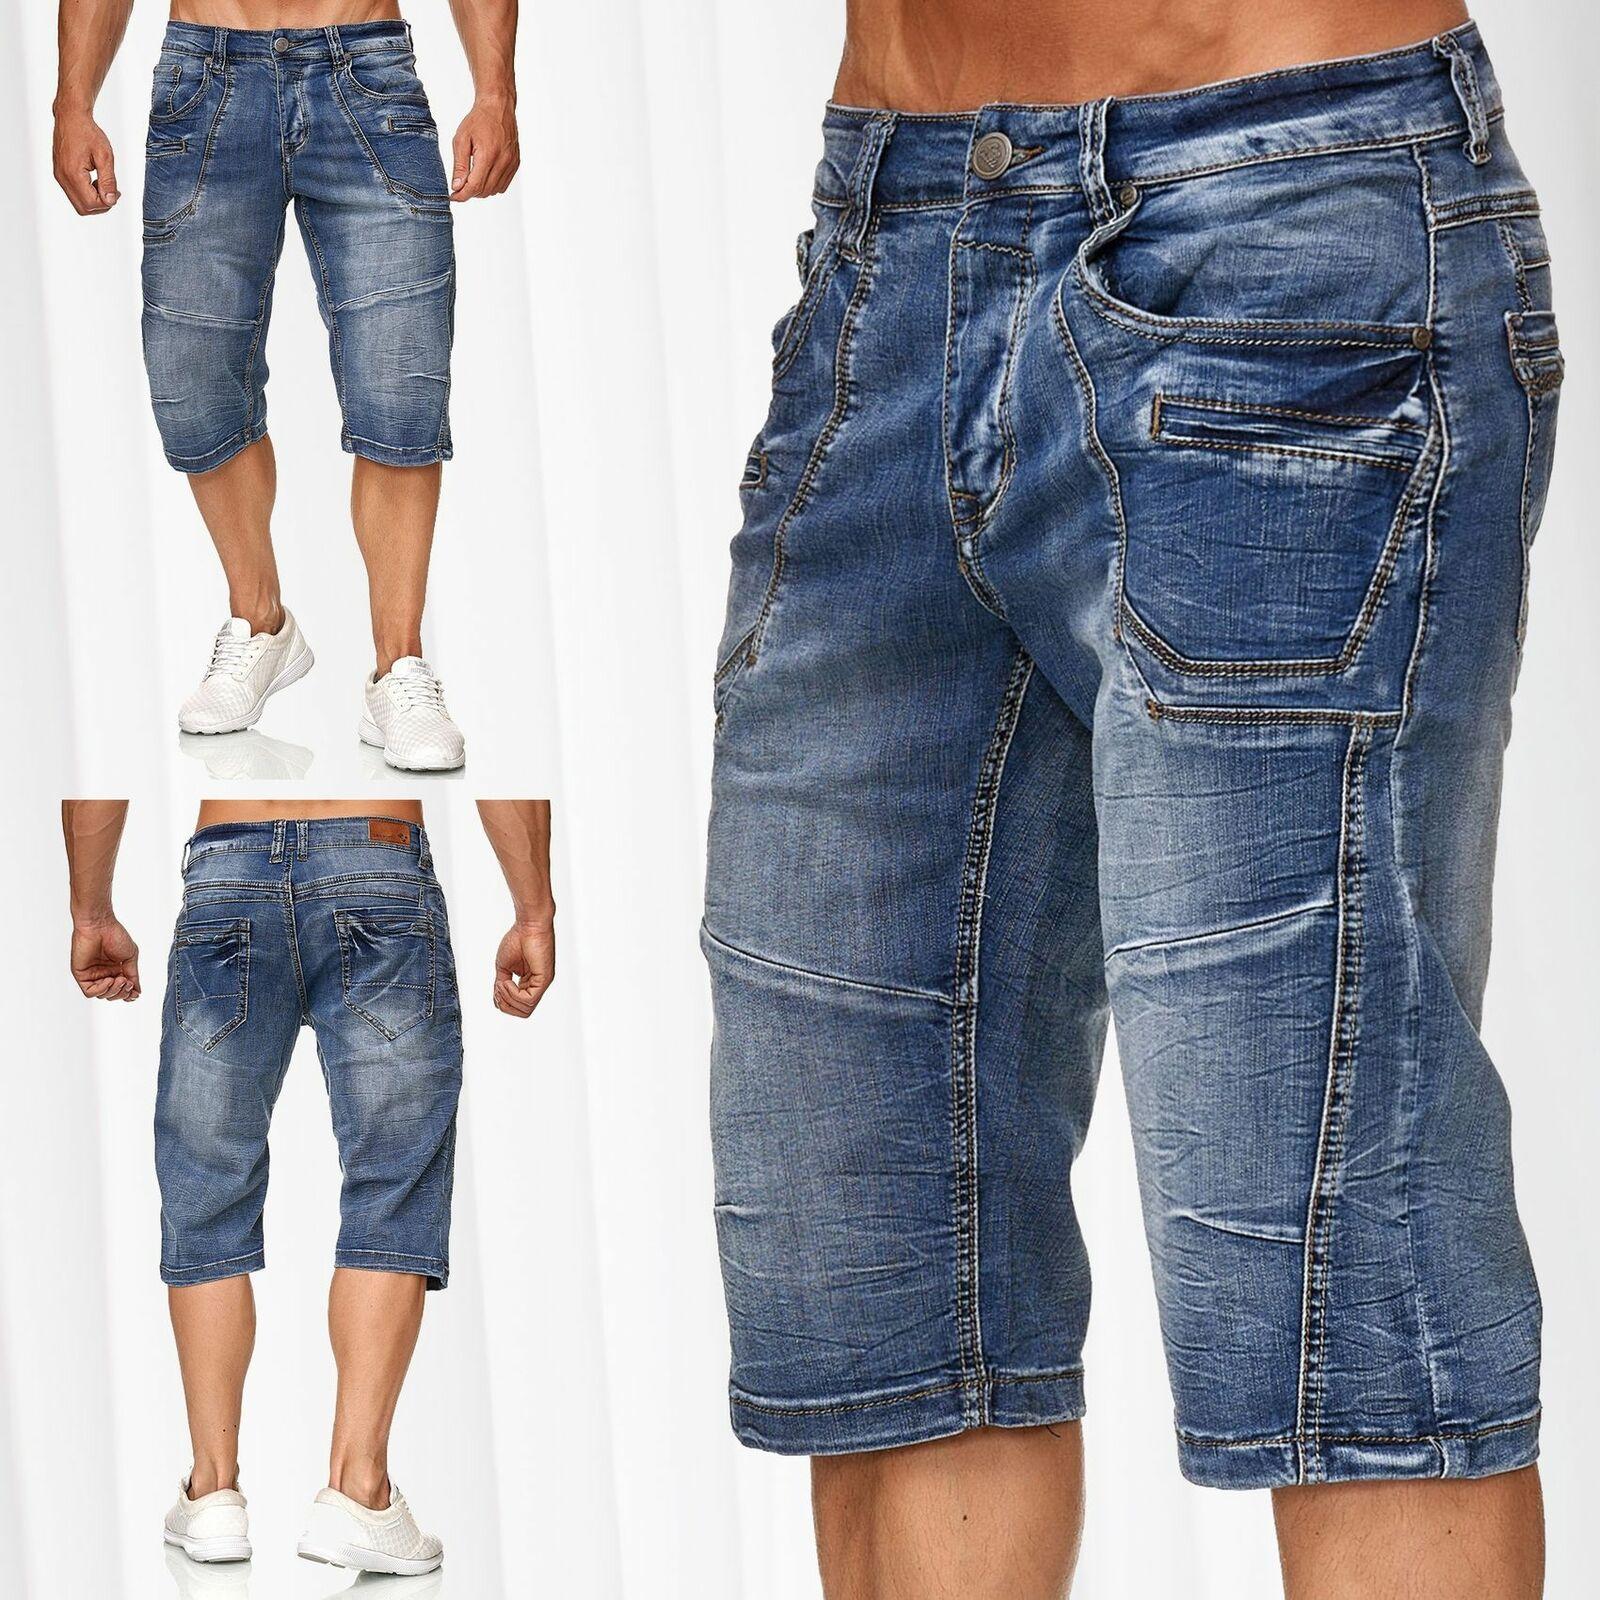 Kurze Herren Jeans Shorts Bermuda Vintage Capri Baumwolle Waschung Sommer Hose